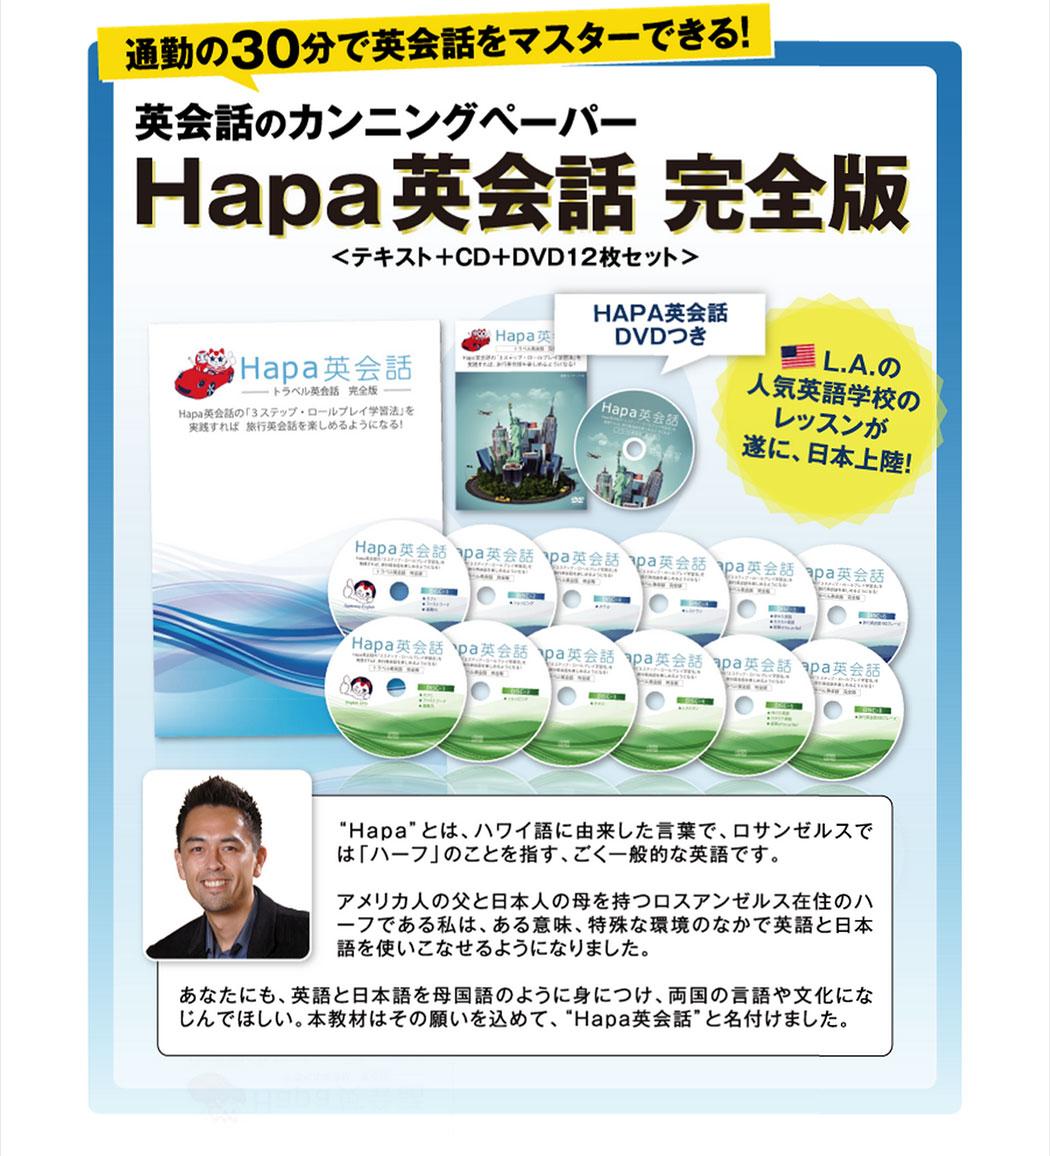 hapa-new-lp10.jpg